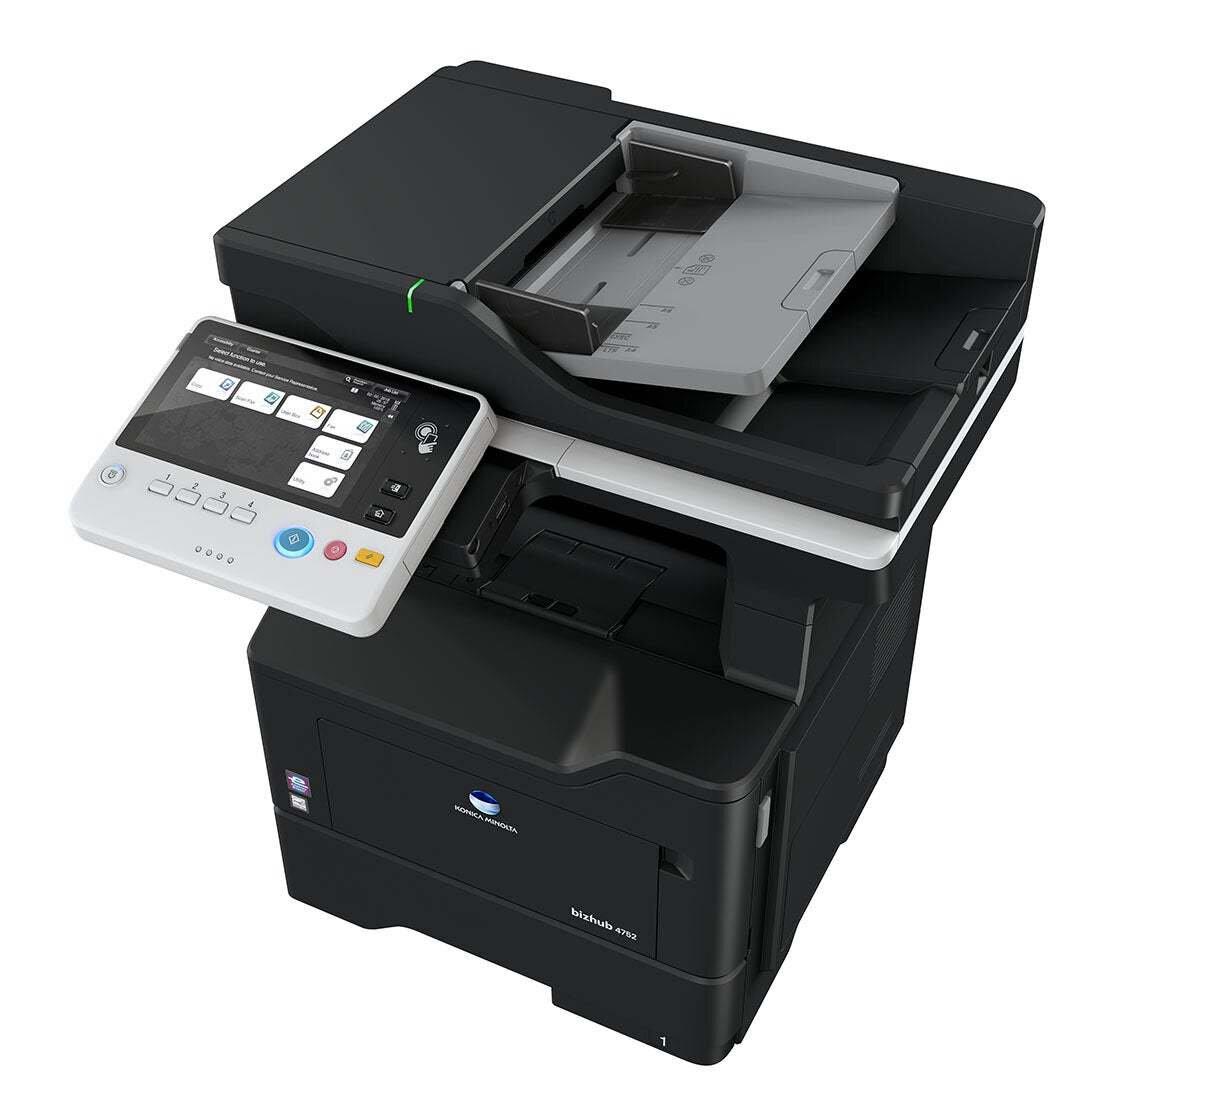 Konica Minolta bizhub 4752 office printer